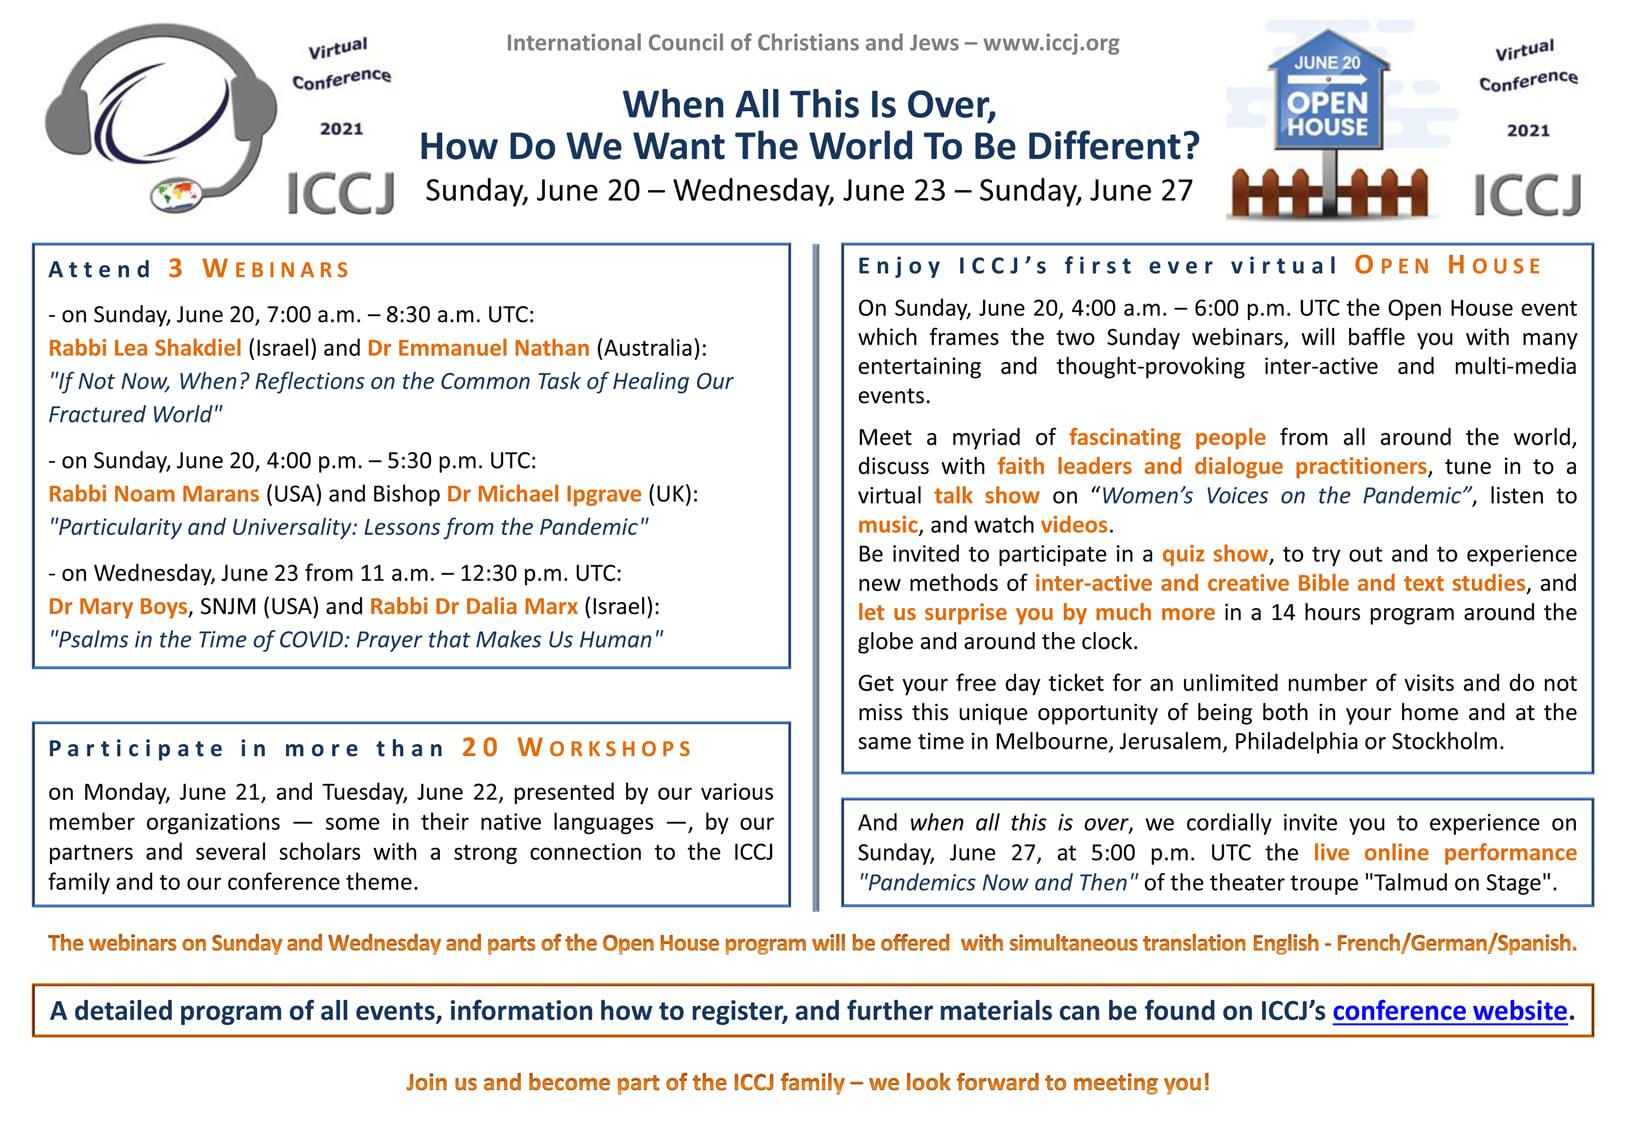 2021-06-06-iccj-konferencja-plakat.jpg